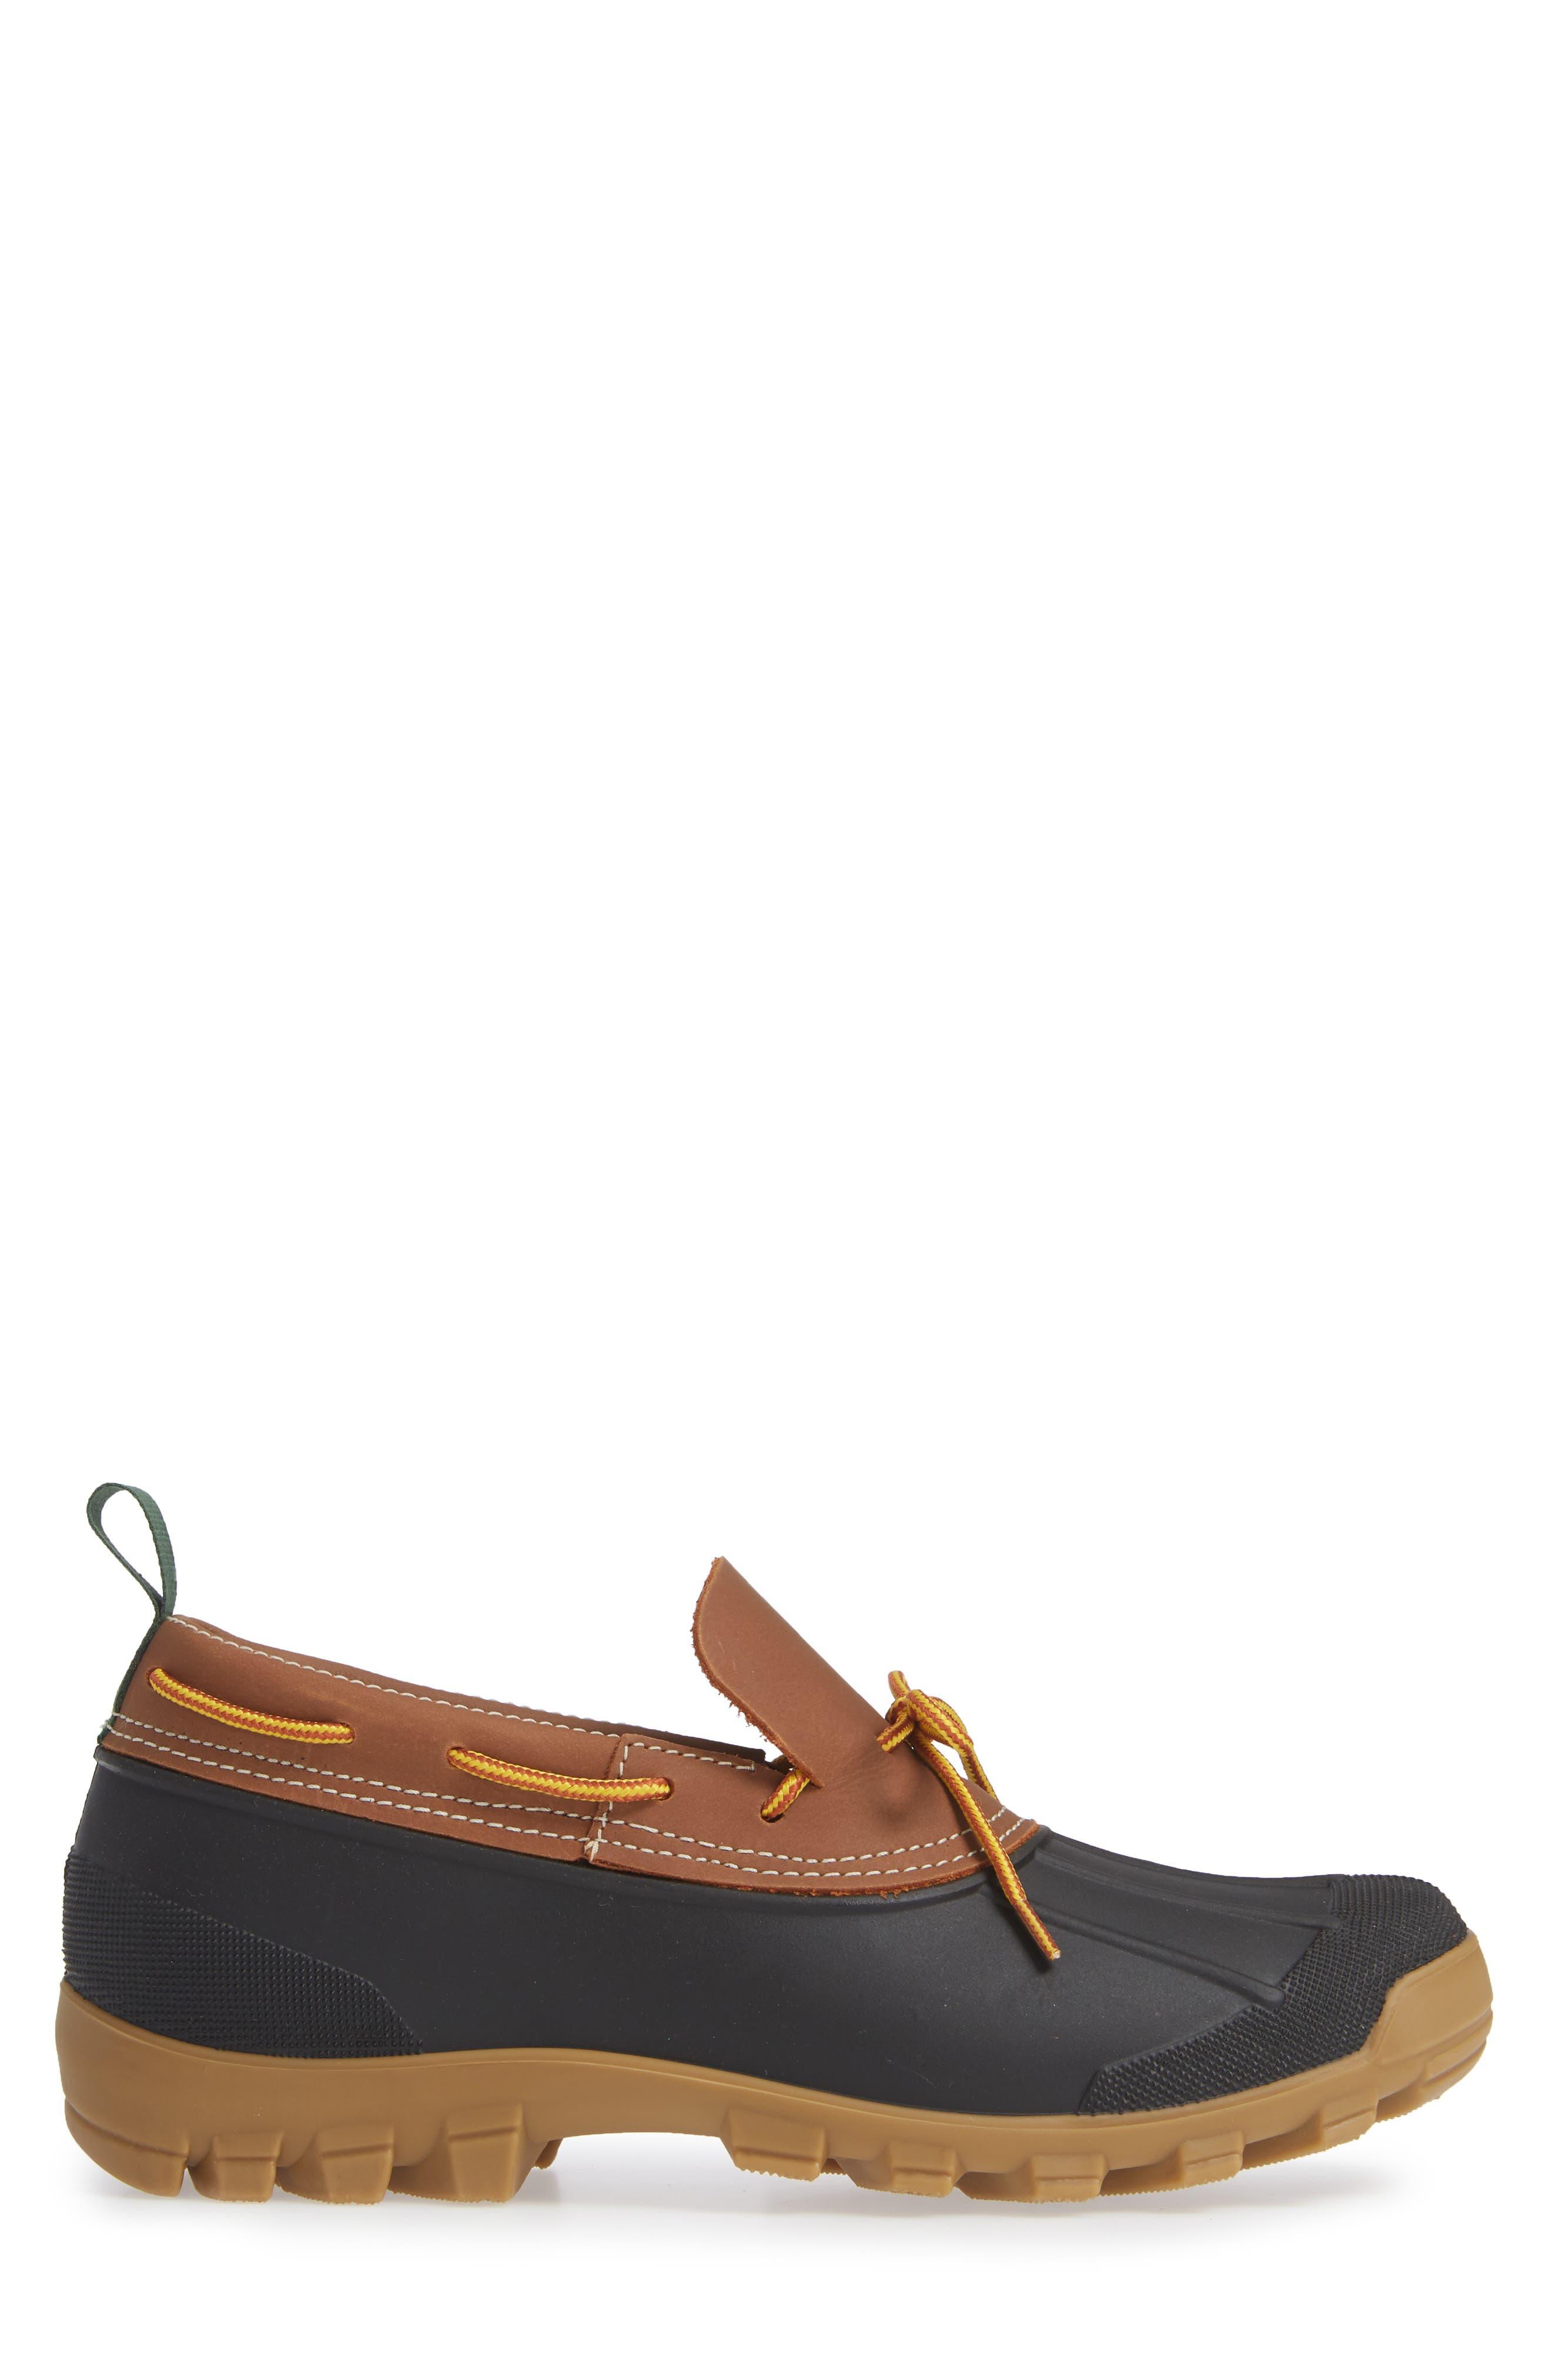 Yukon Short Waterproof Boot,                             Alternate thumbnail 3, color,                             TAN LEATHER